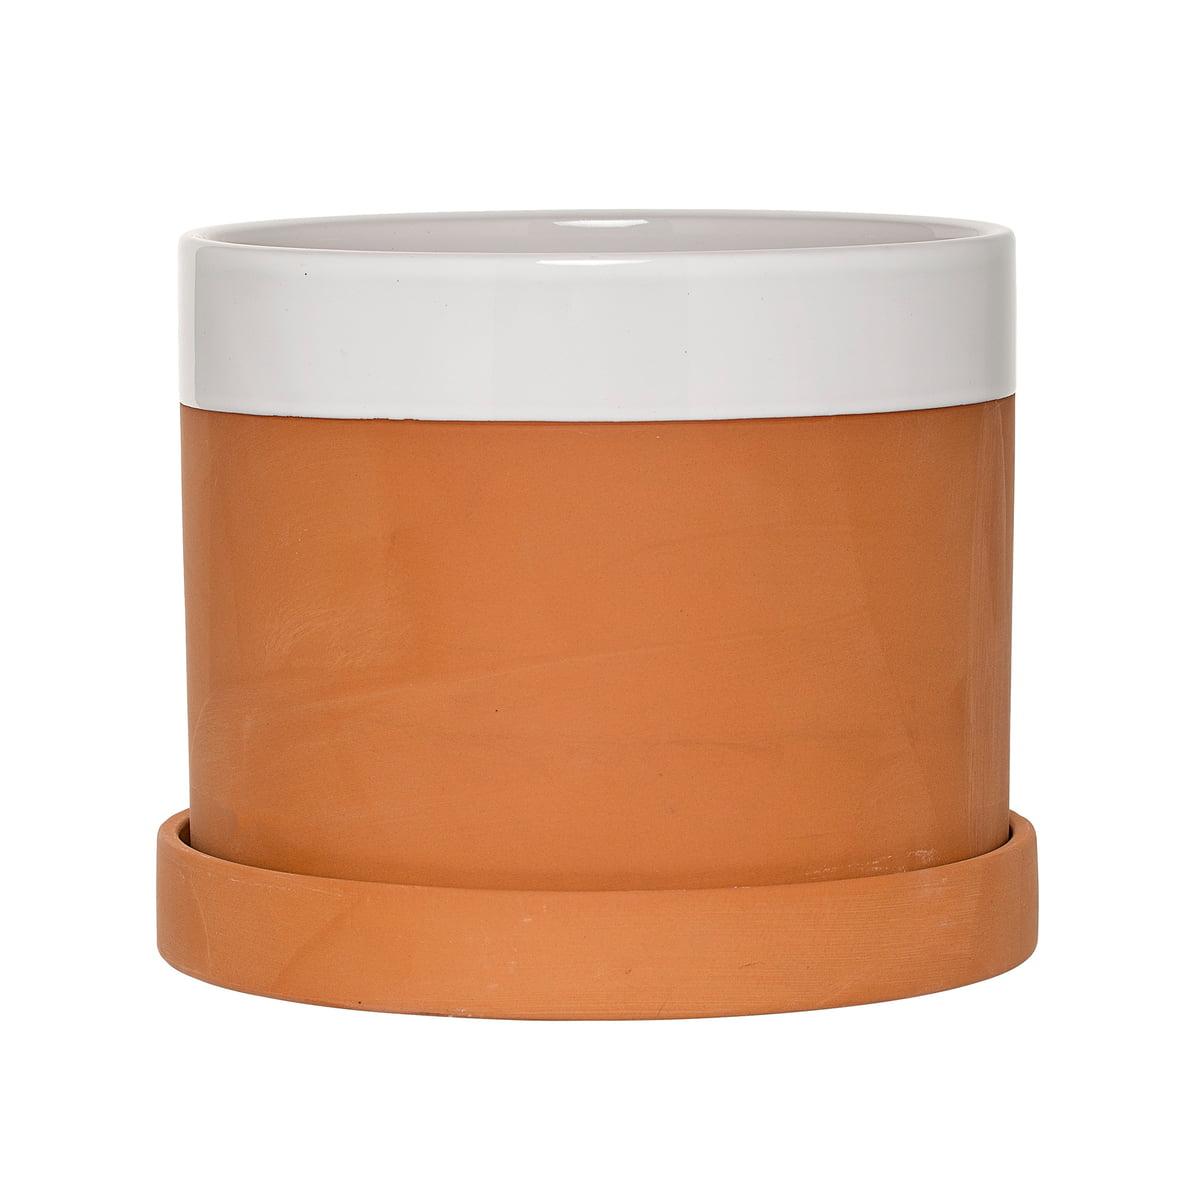 225 & Bloomingville - Terracotta Flower Pot with Saucer white / terracotta